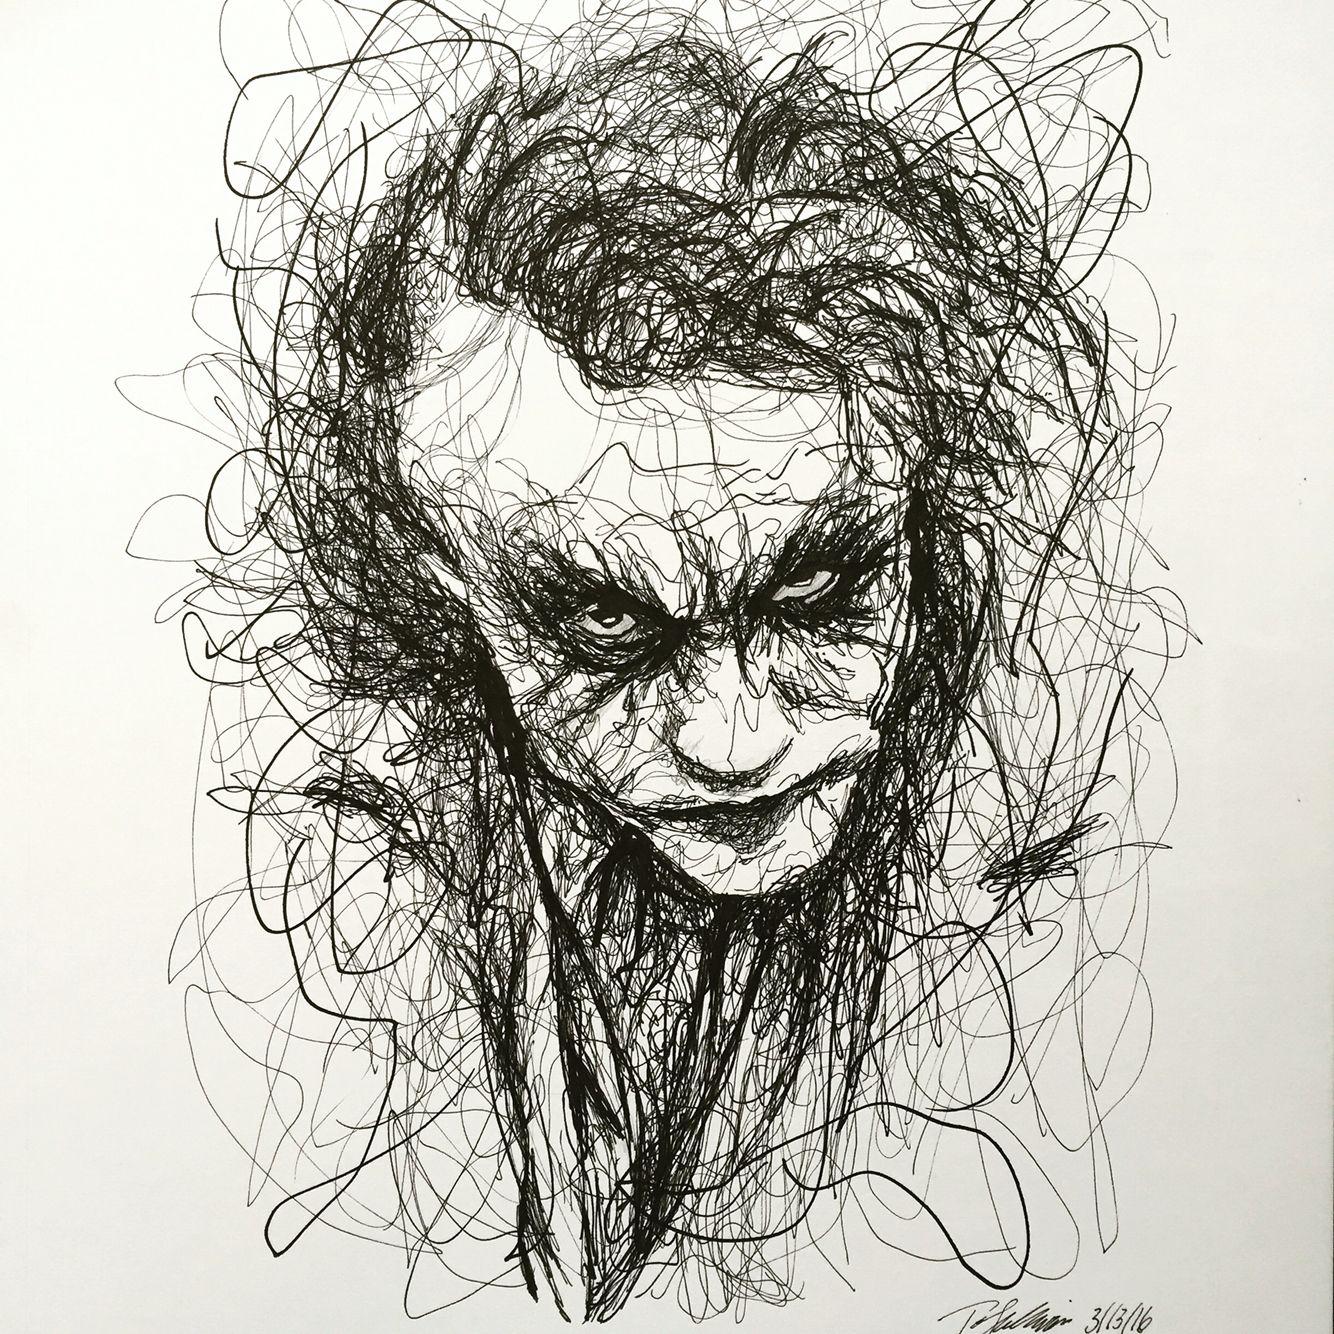 Pin On The Art Of Tom Sullivan Aka Sulbone